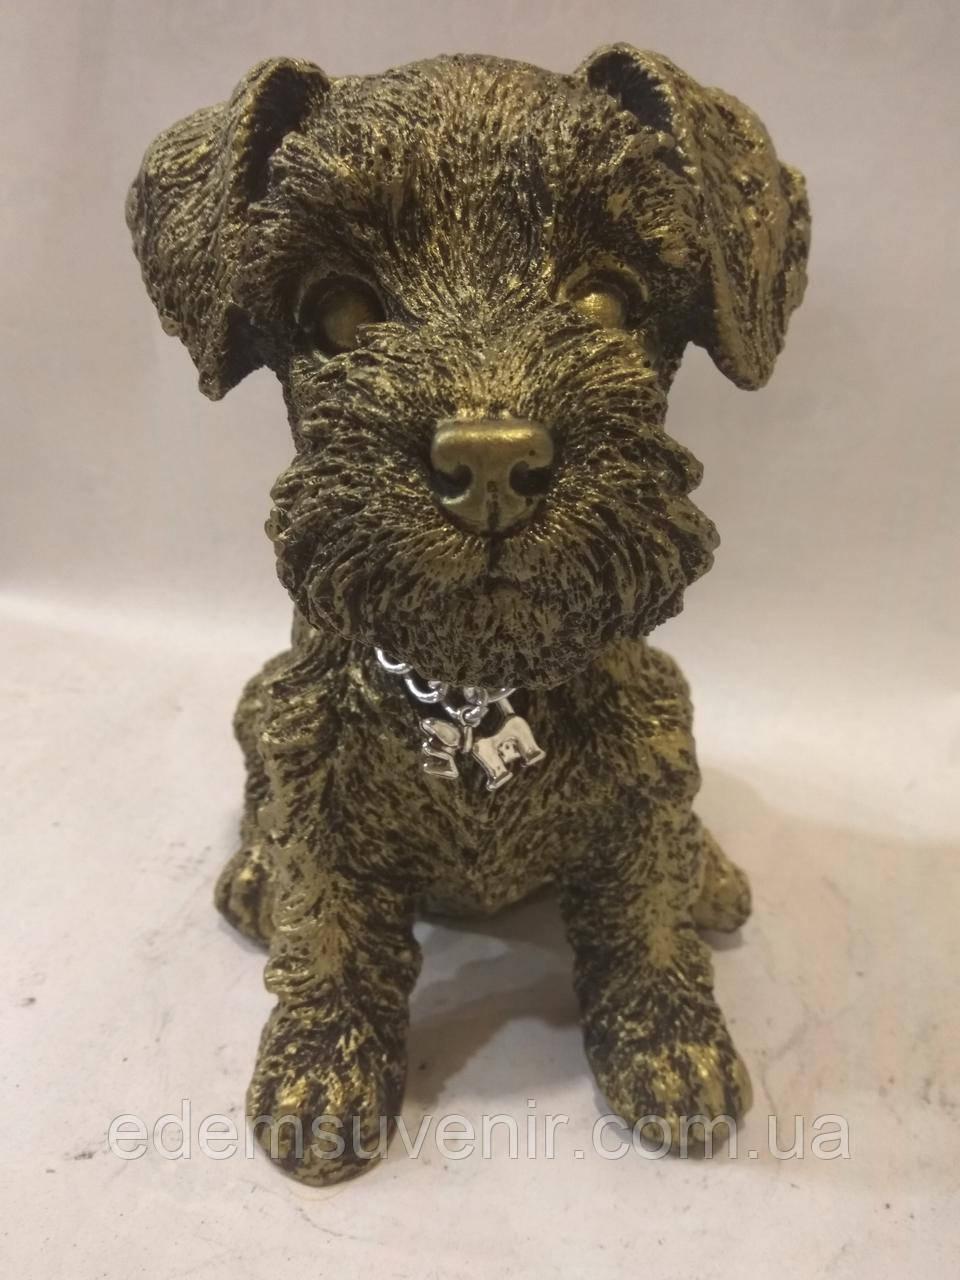 Статуэтка (копилка) щенок Шнауцера золото